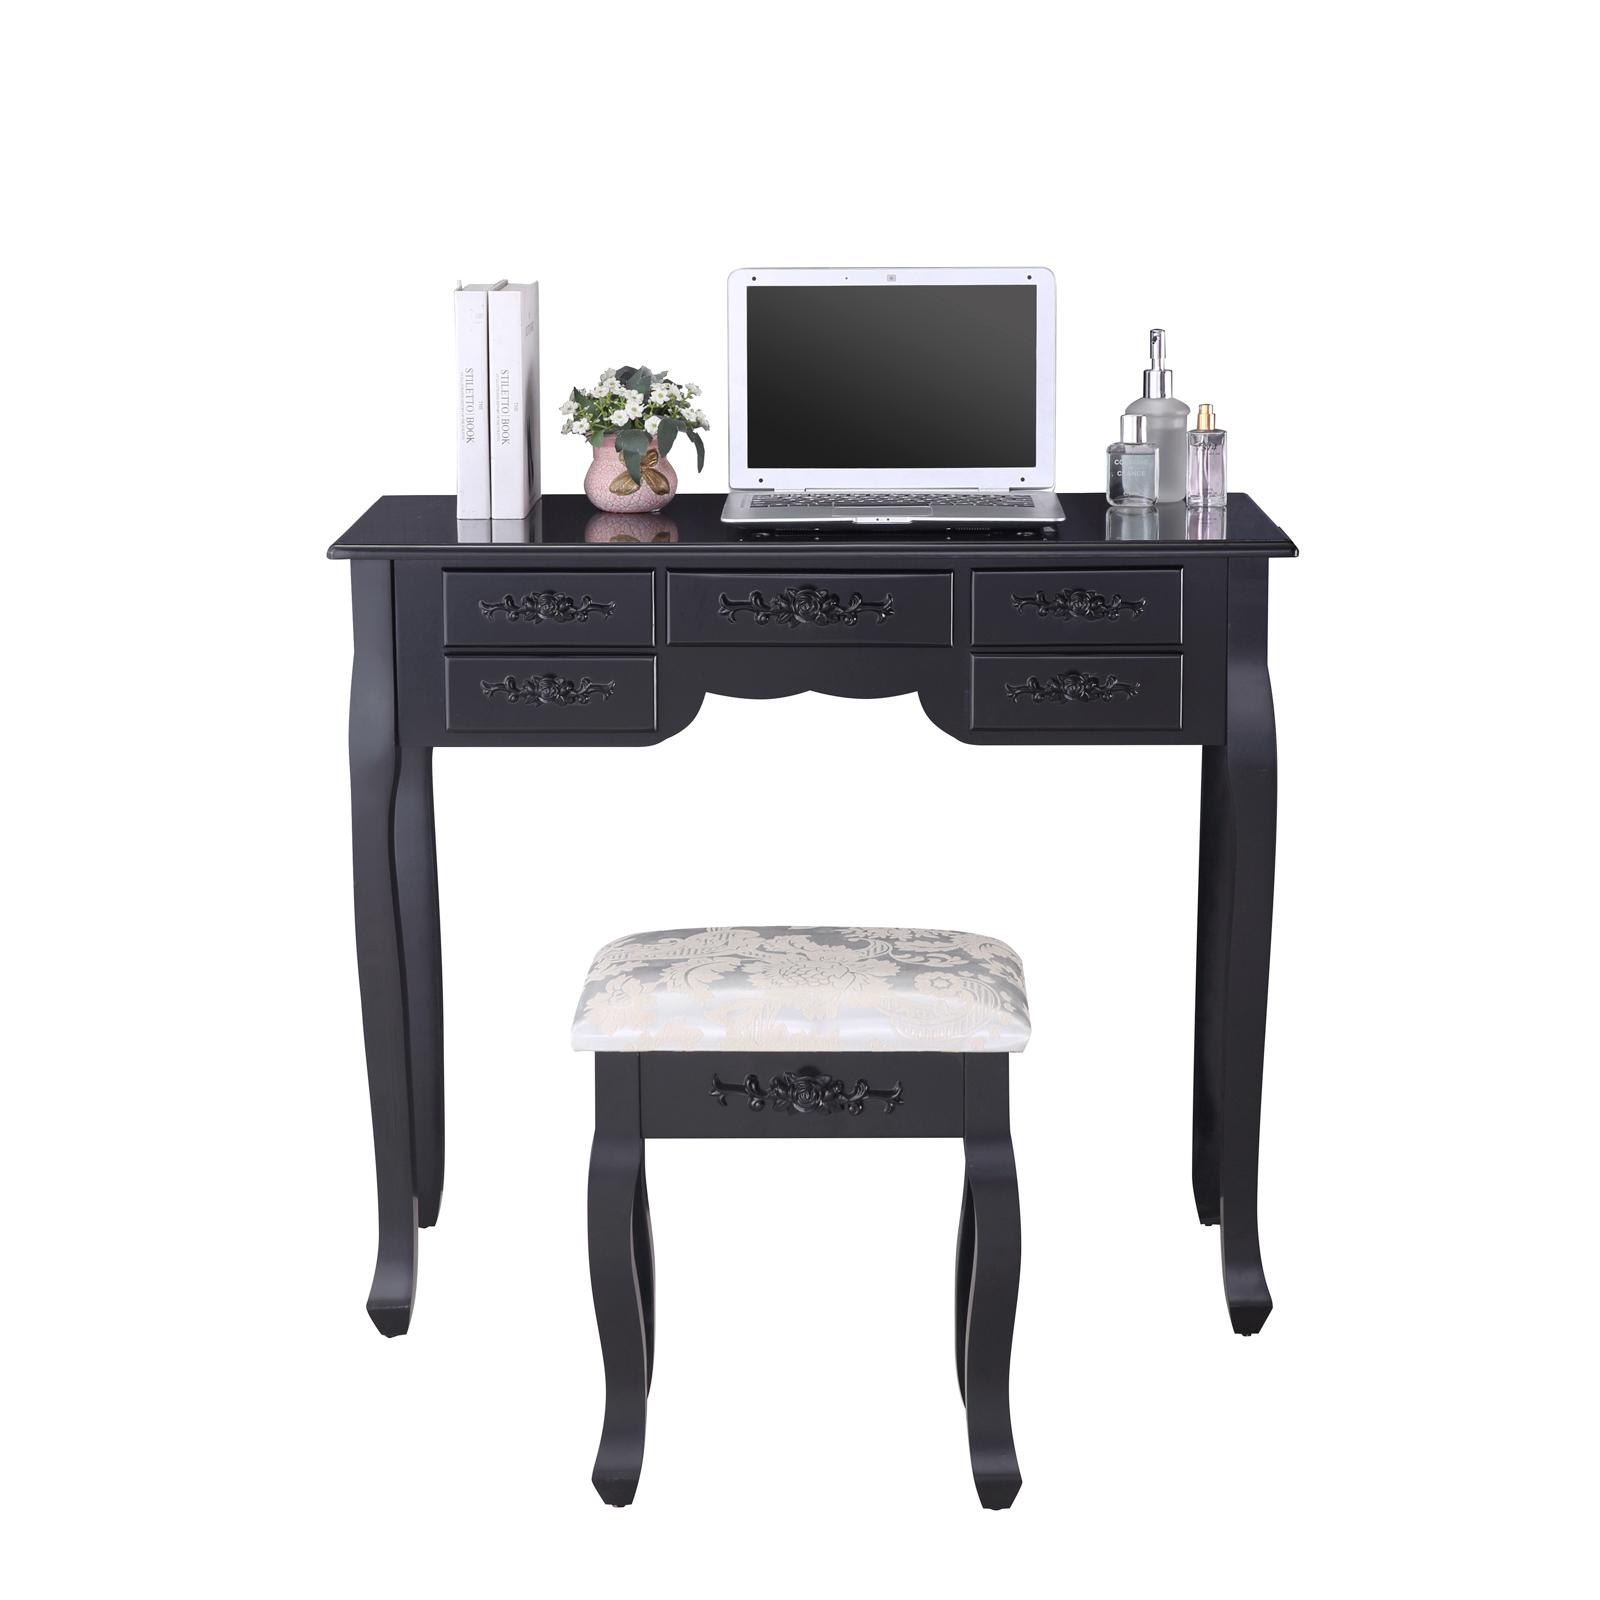 Black dressing table vanity makeup desk w 7 drawers 3 for Black vanity desk with mirror